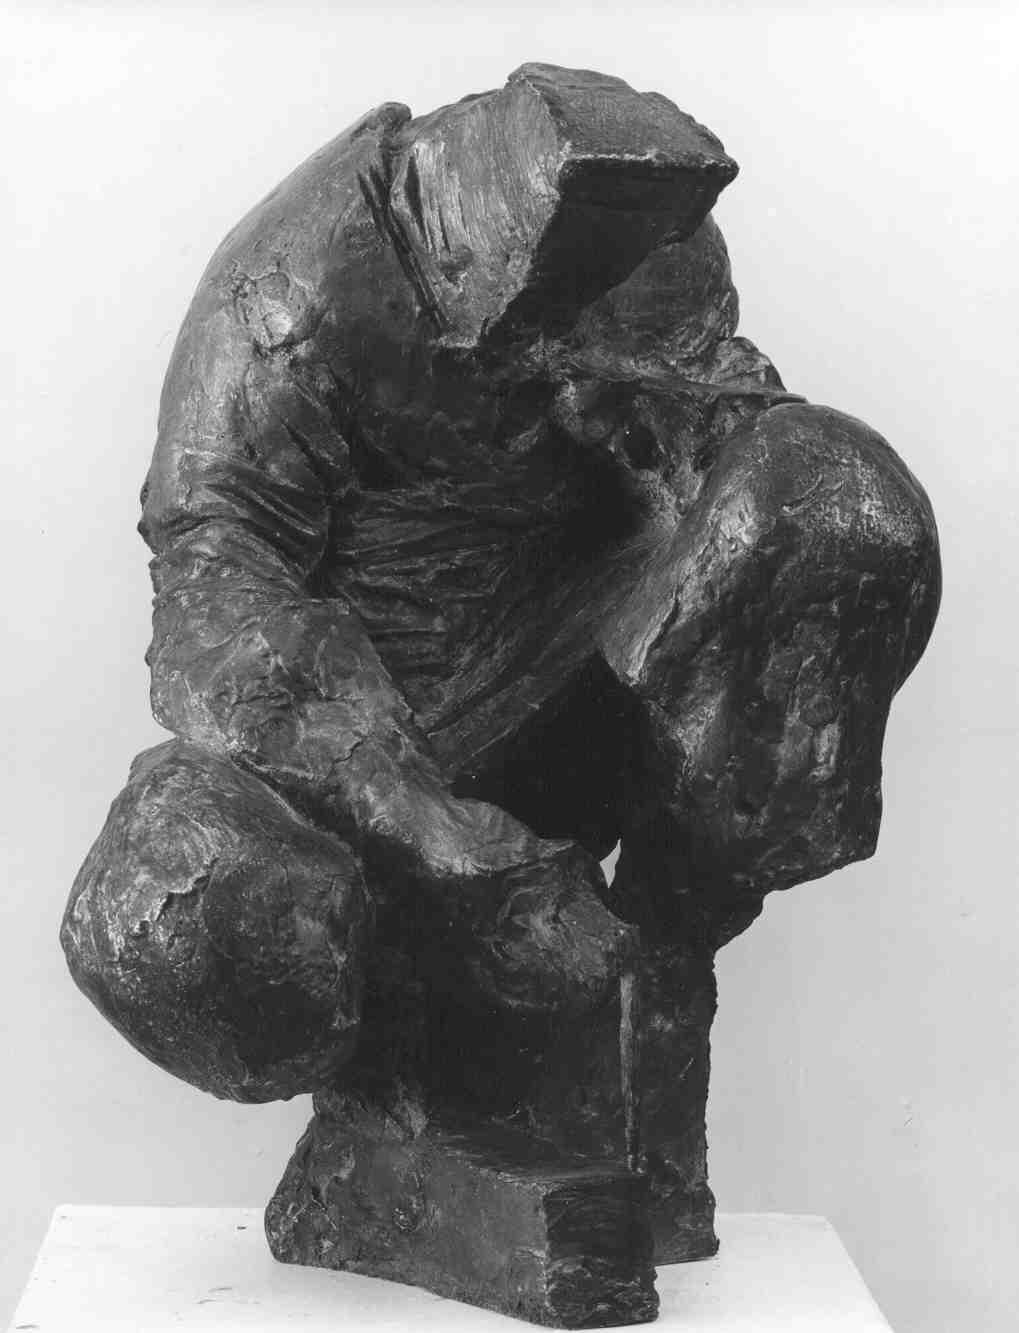 Welder, Hanzik S., 1961